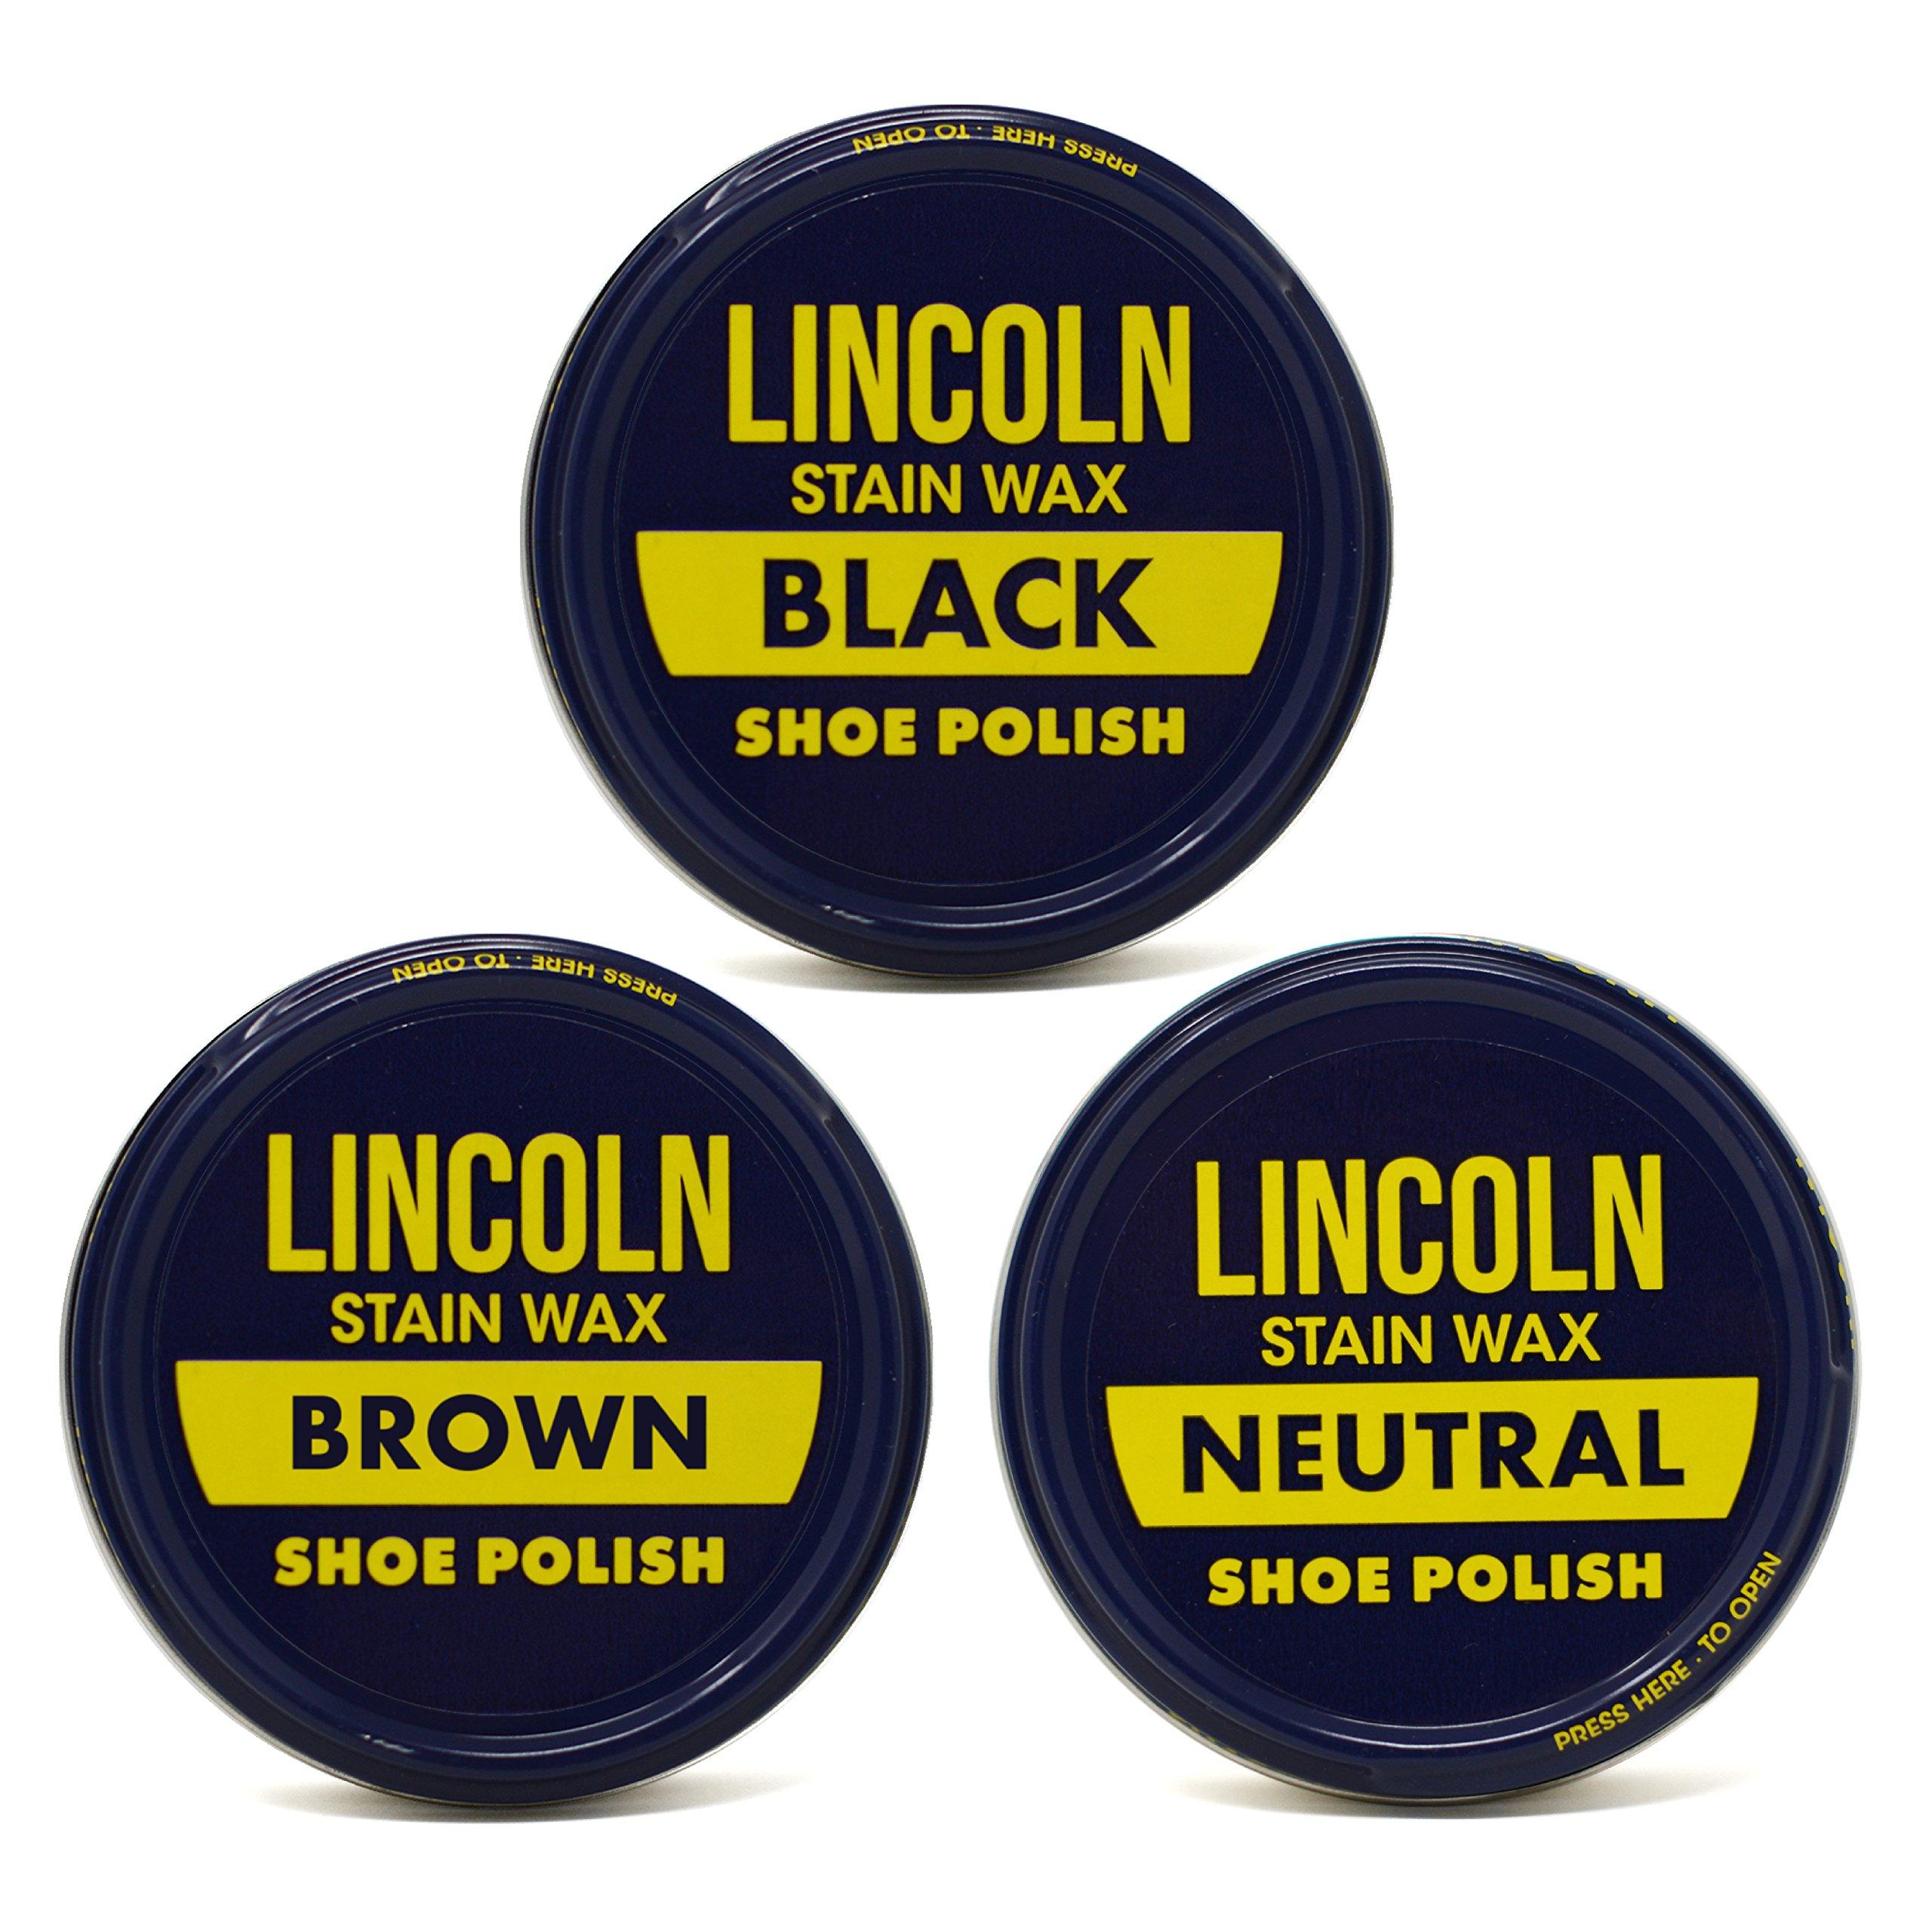 Lincoln Stain Wax Shoe Polish Black, Brown, Neutral Variety 3 fl oz, 3 Pack